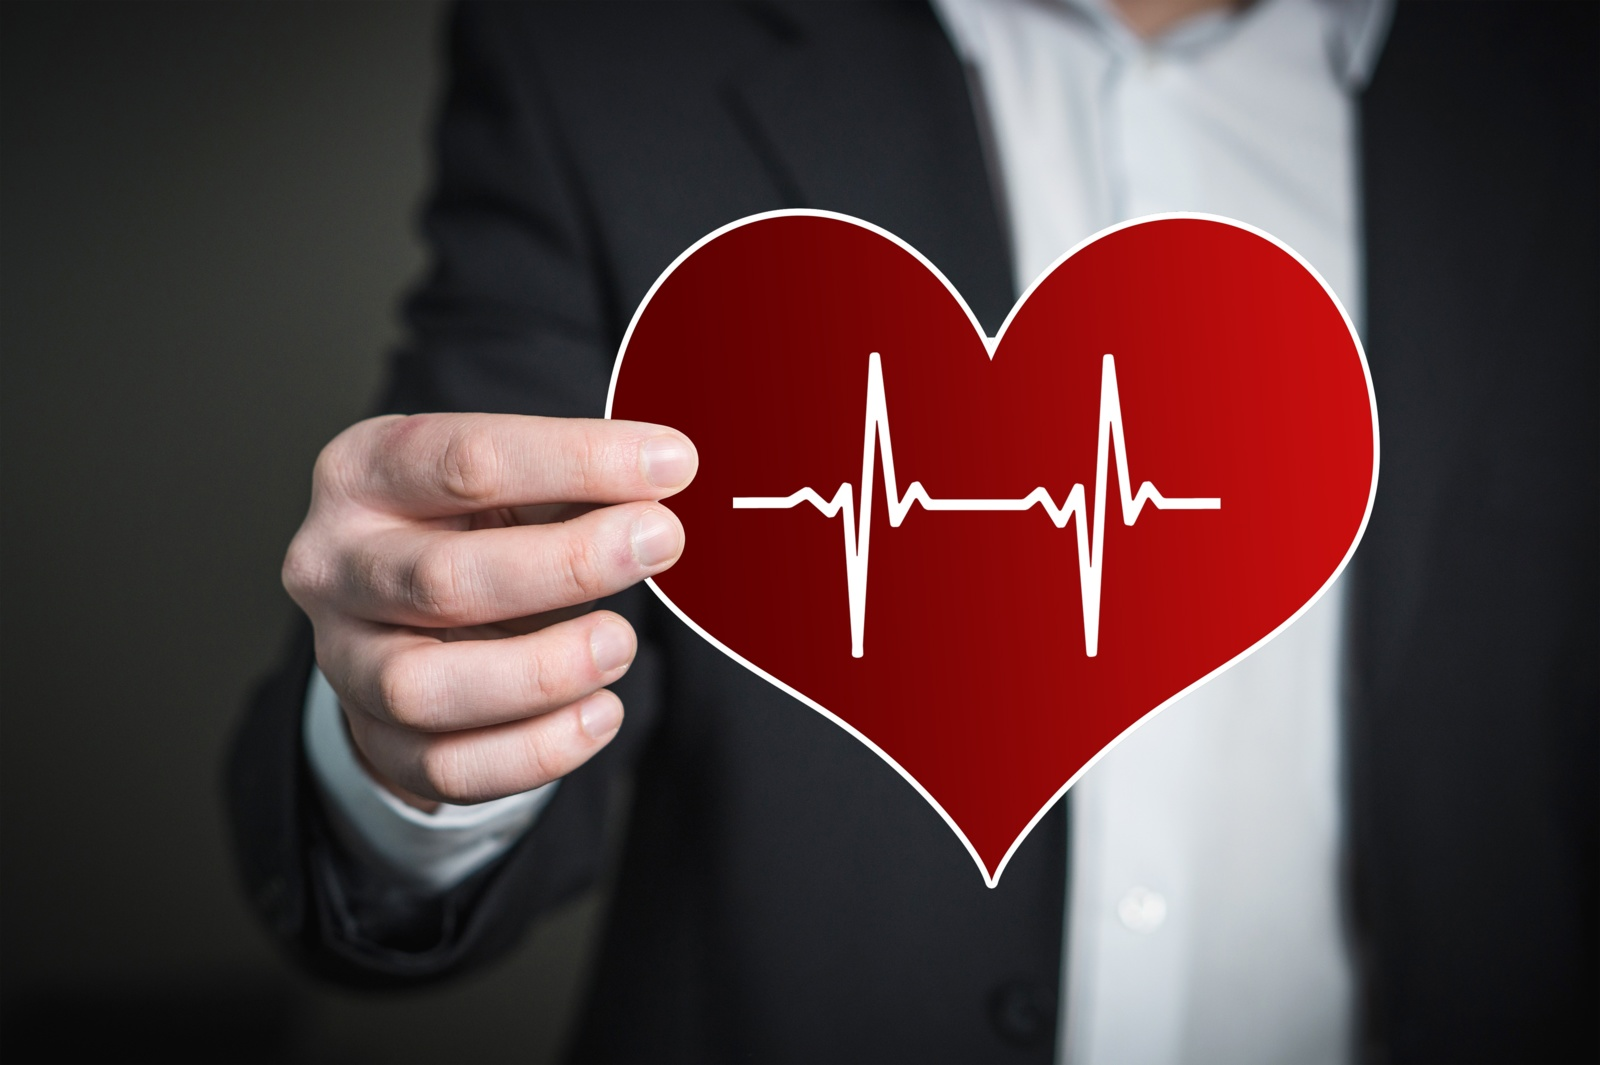 hipertenzija galite gerti